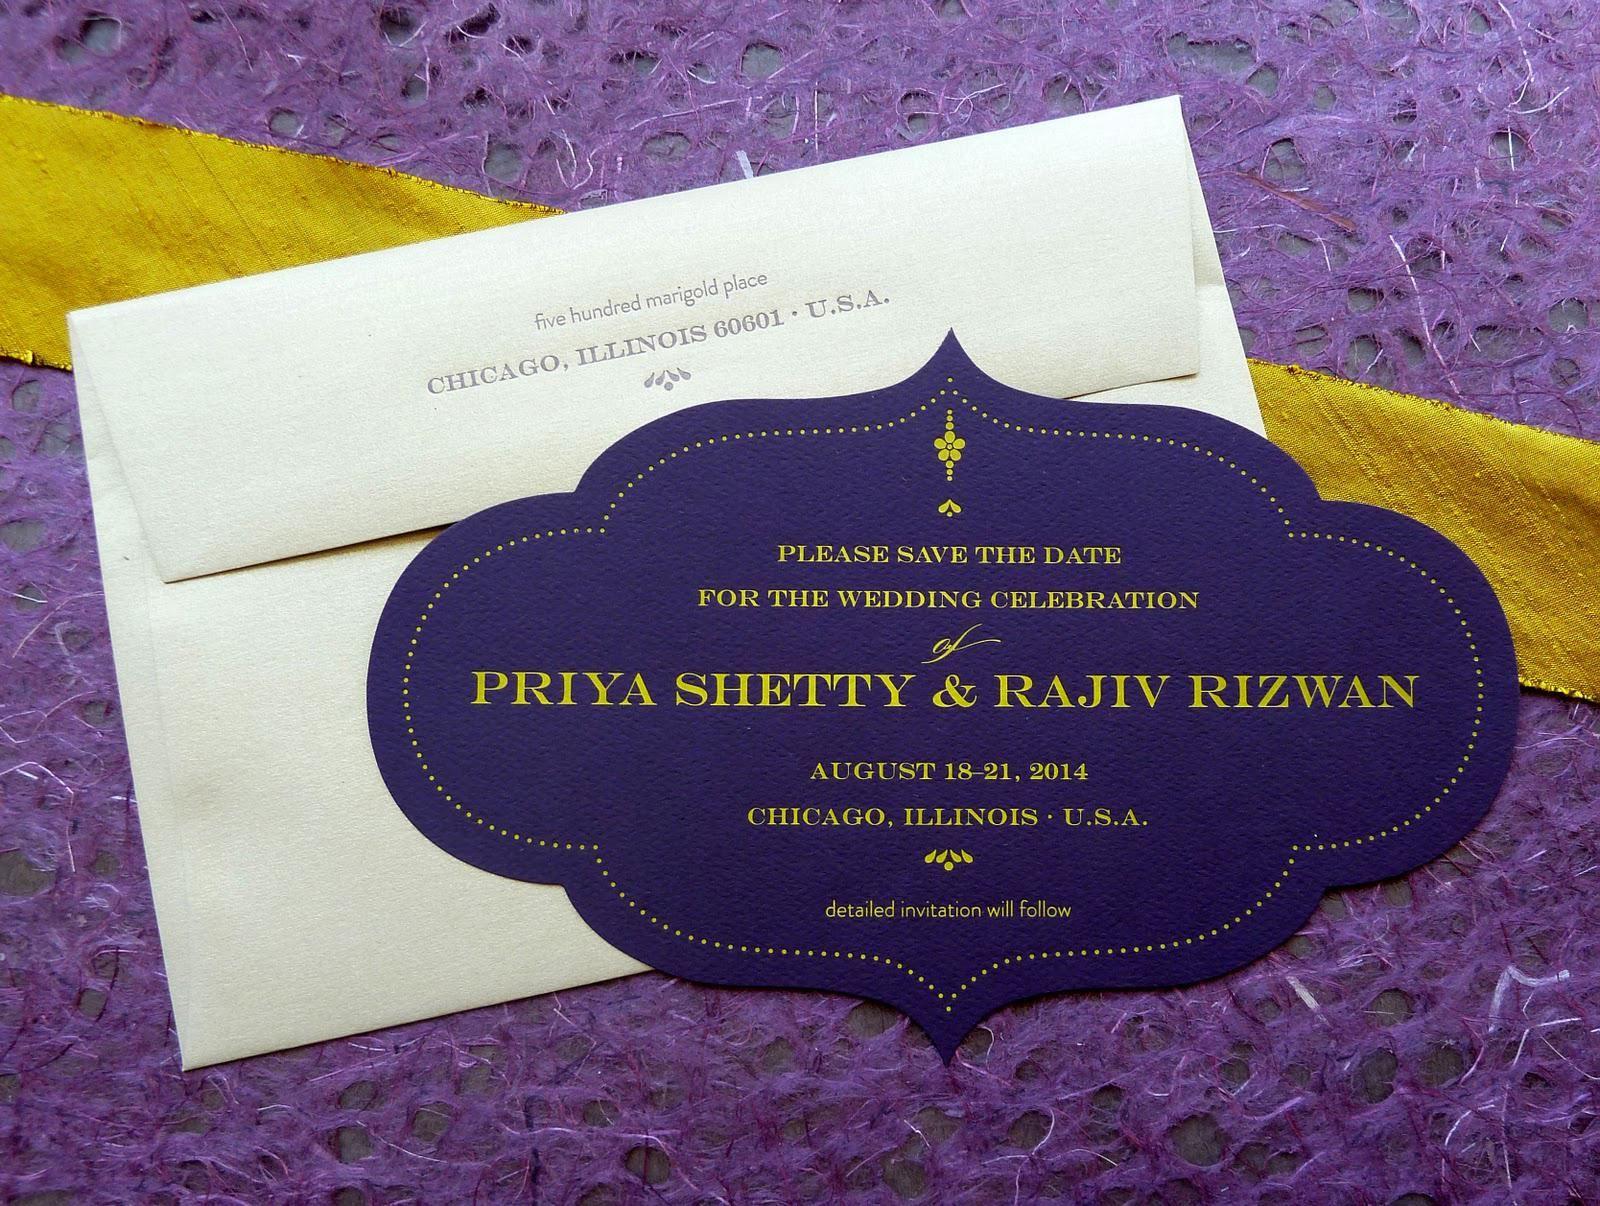 wedding invitation card format marathi wording%0A Indian Wedding Invitation Cards   Indian Wedding Invitation Cards Uk   Superb Invitation  Superb Invitation